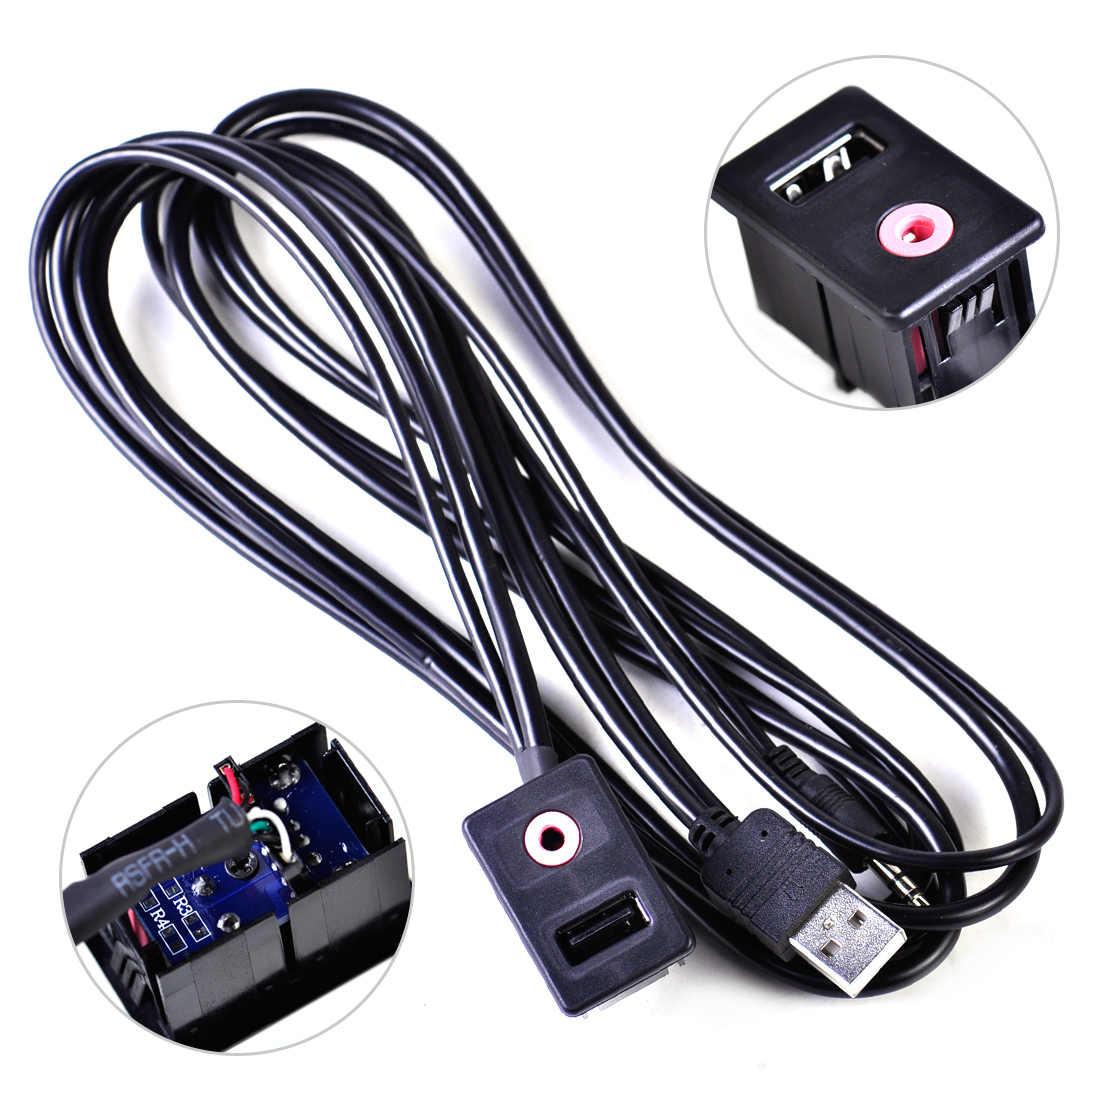 Car Audio Dash Flush Mount USB Port 3.5mm AUX Extension Cable w// Mounting Panel